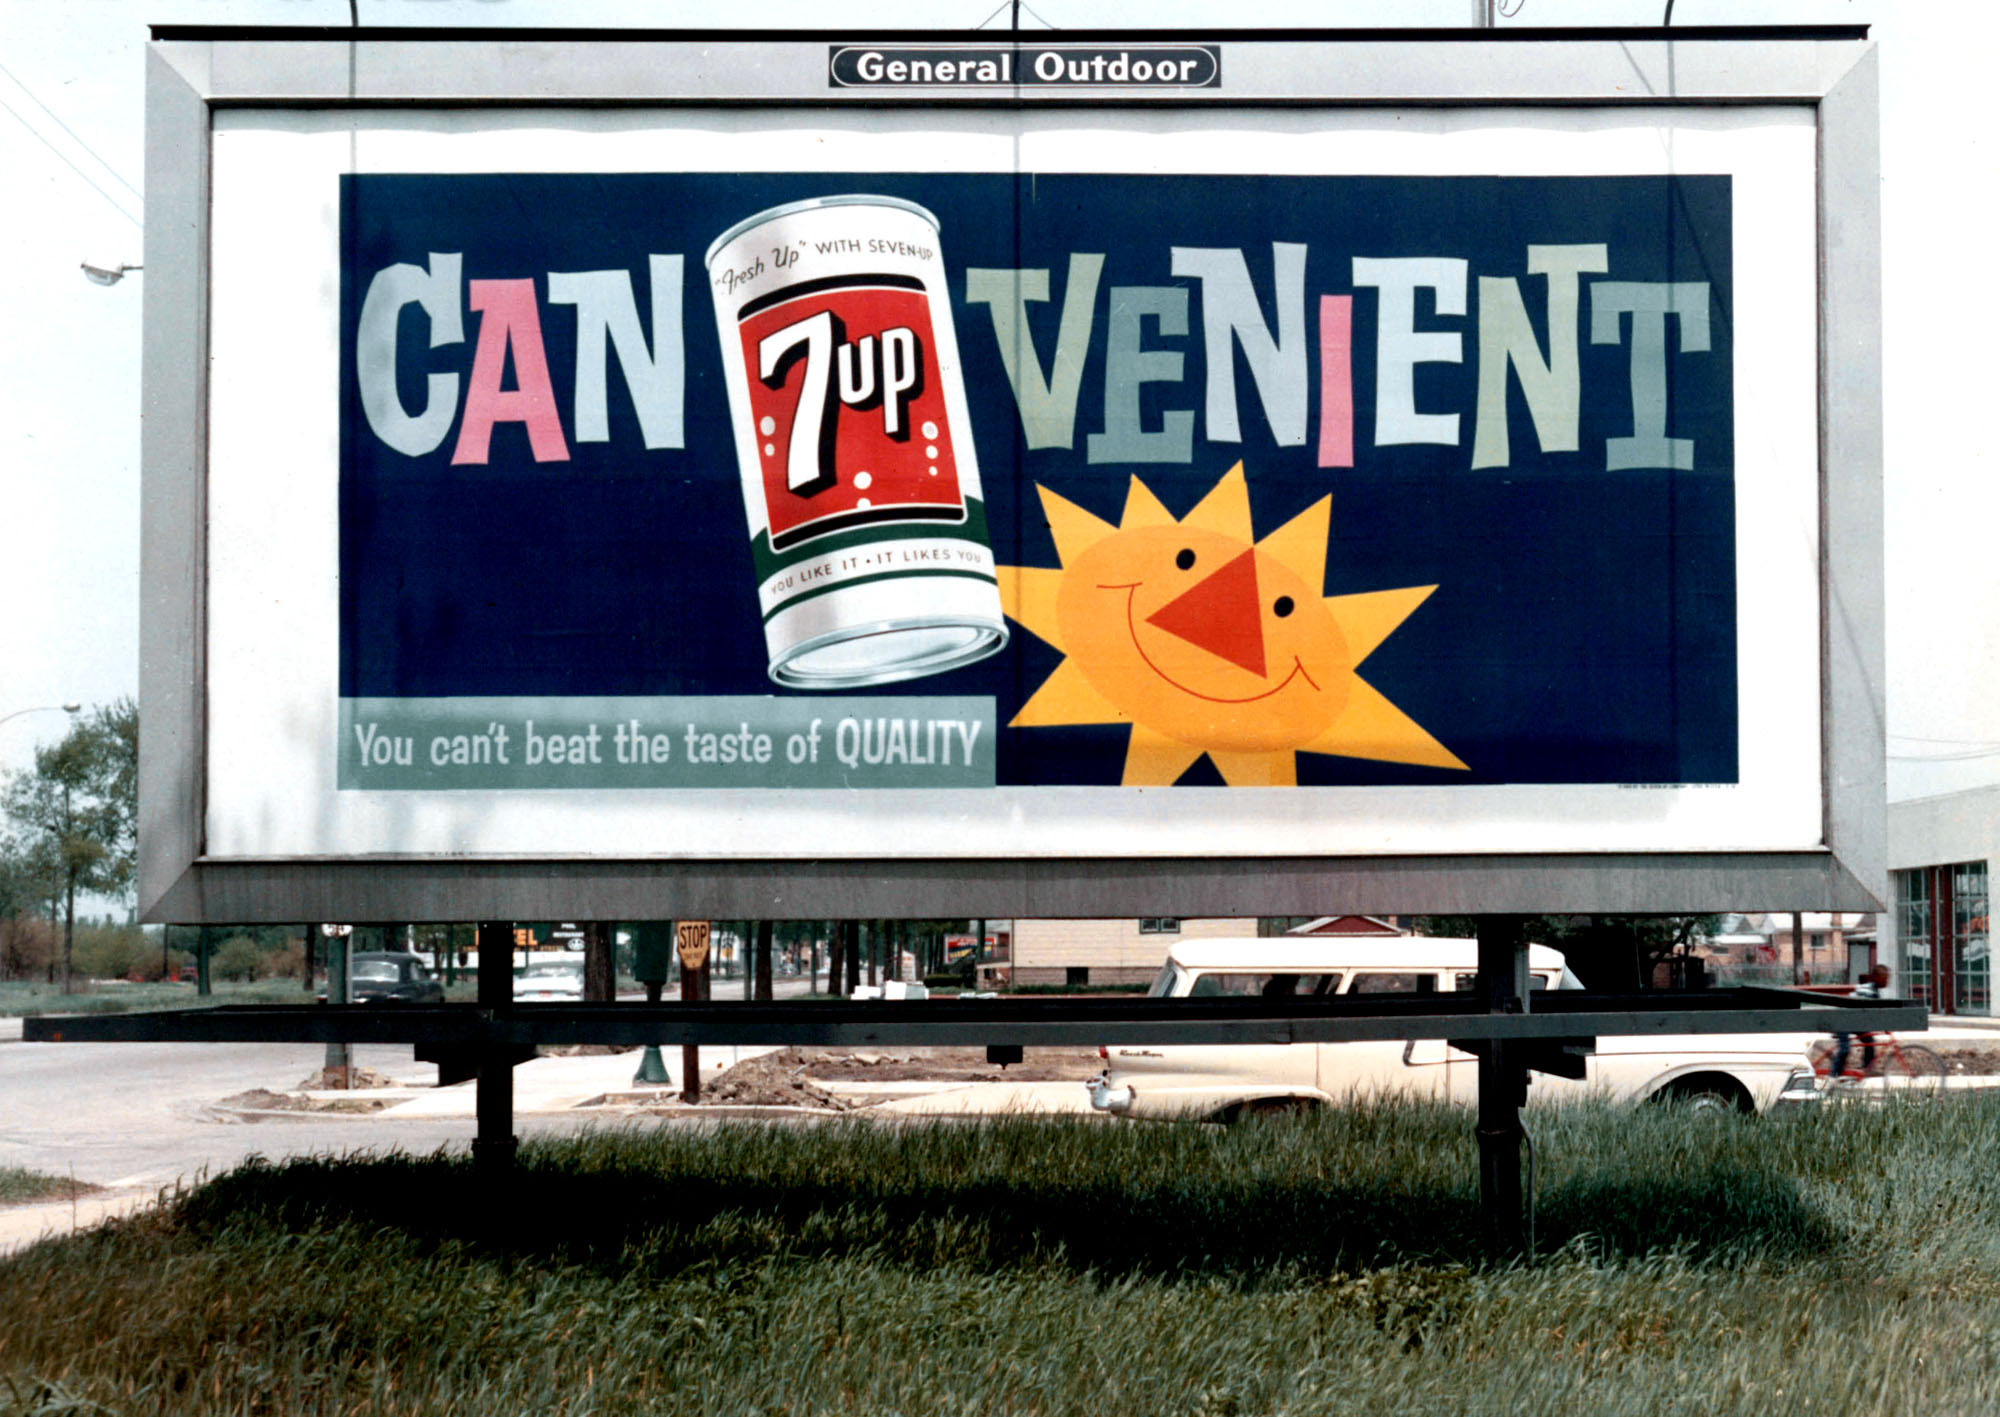 7 Up billboard ad (1950s?)